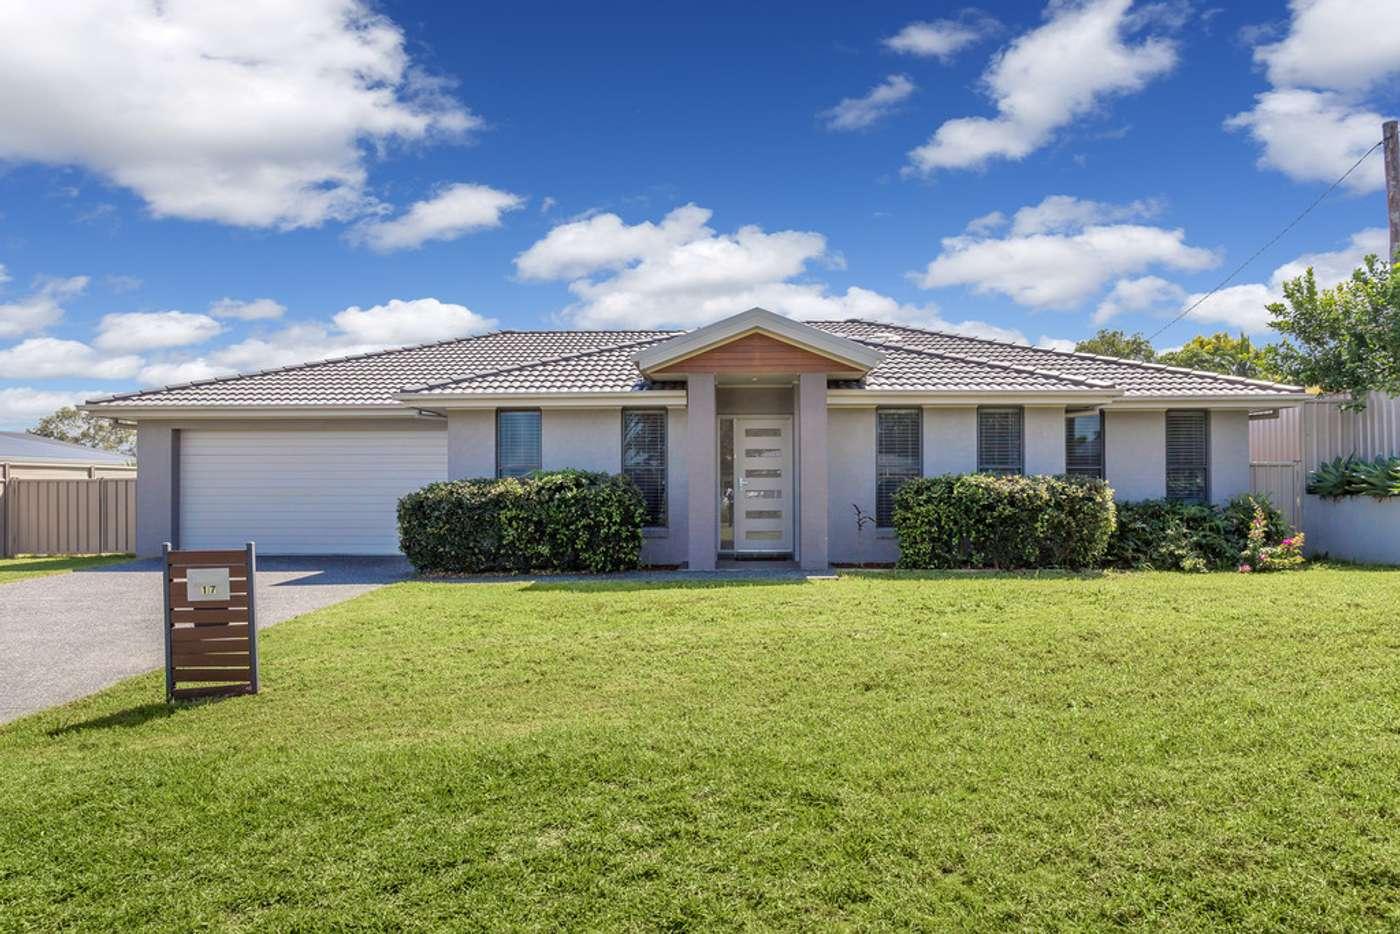 Main view of Homely house listing, 17 Edinburgh Drive, Taree NSW 2430